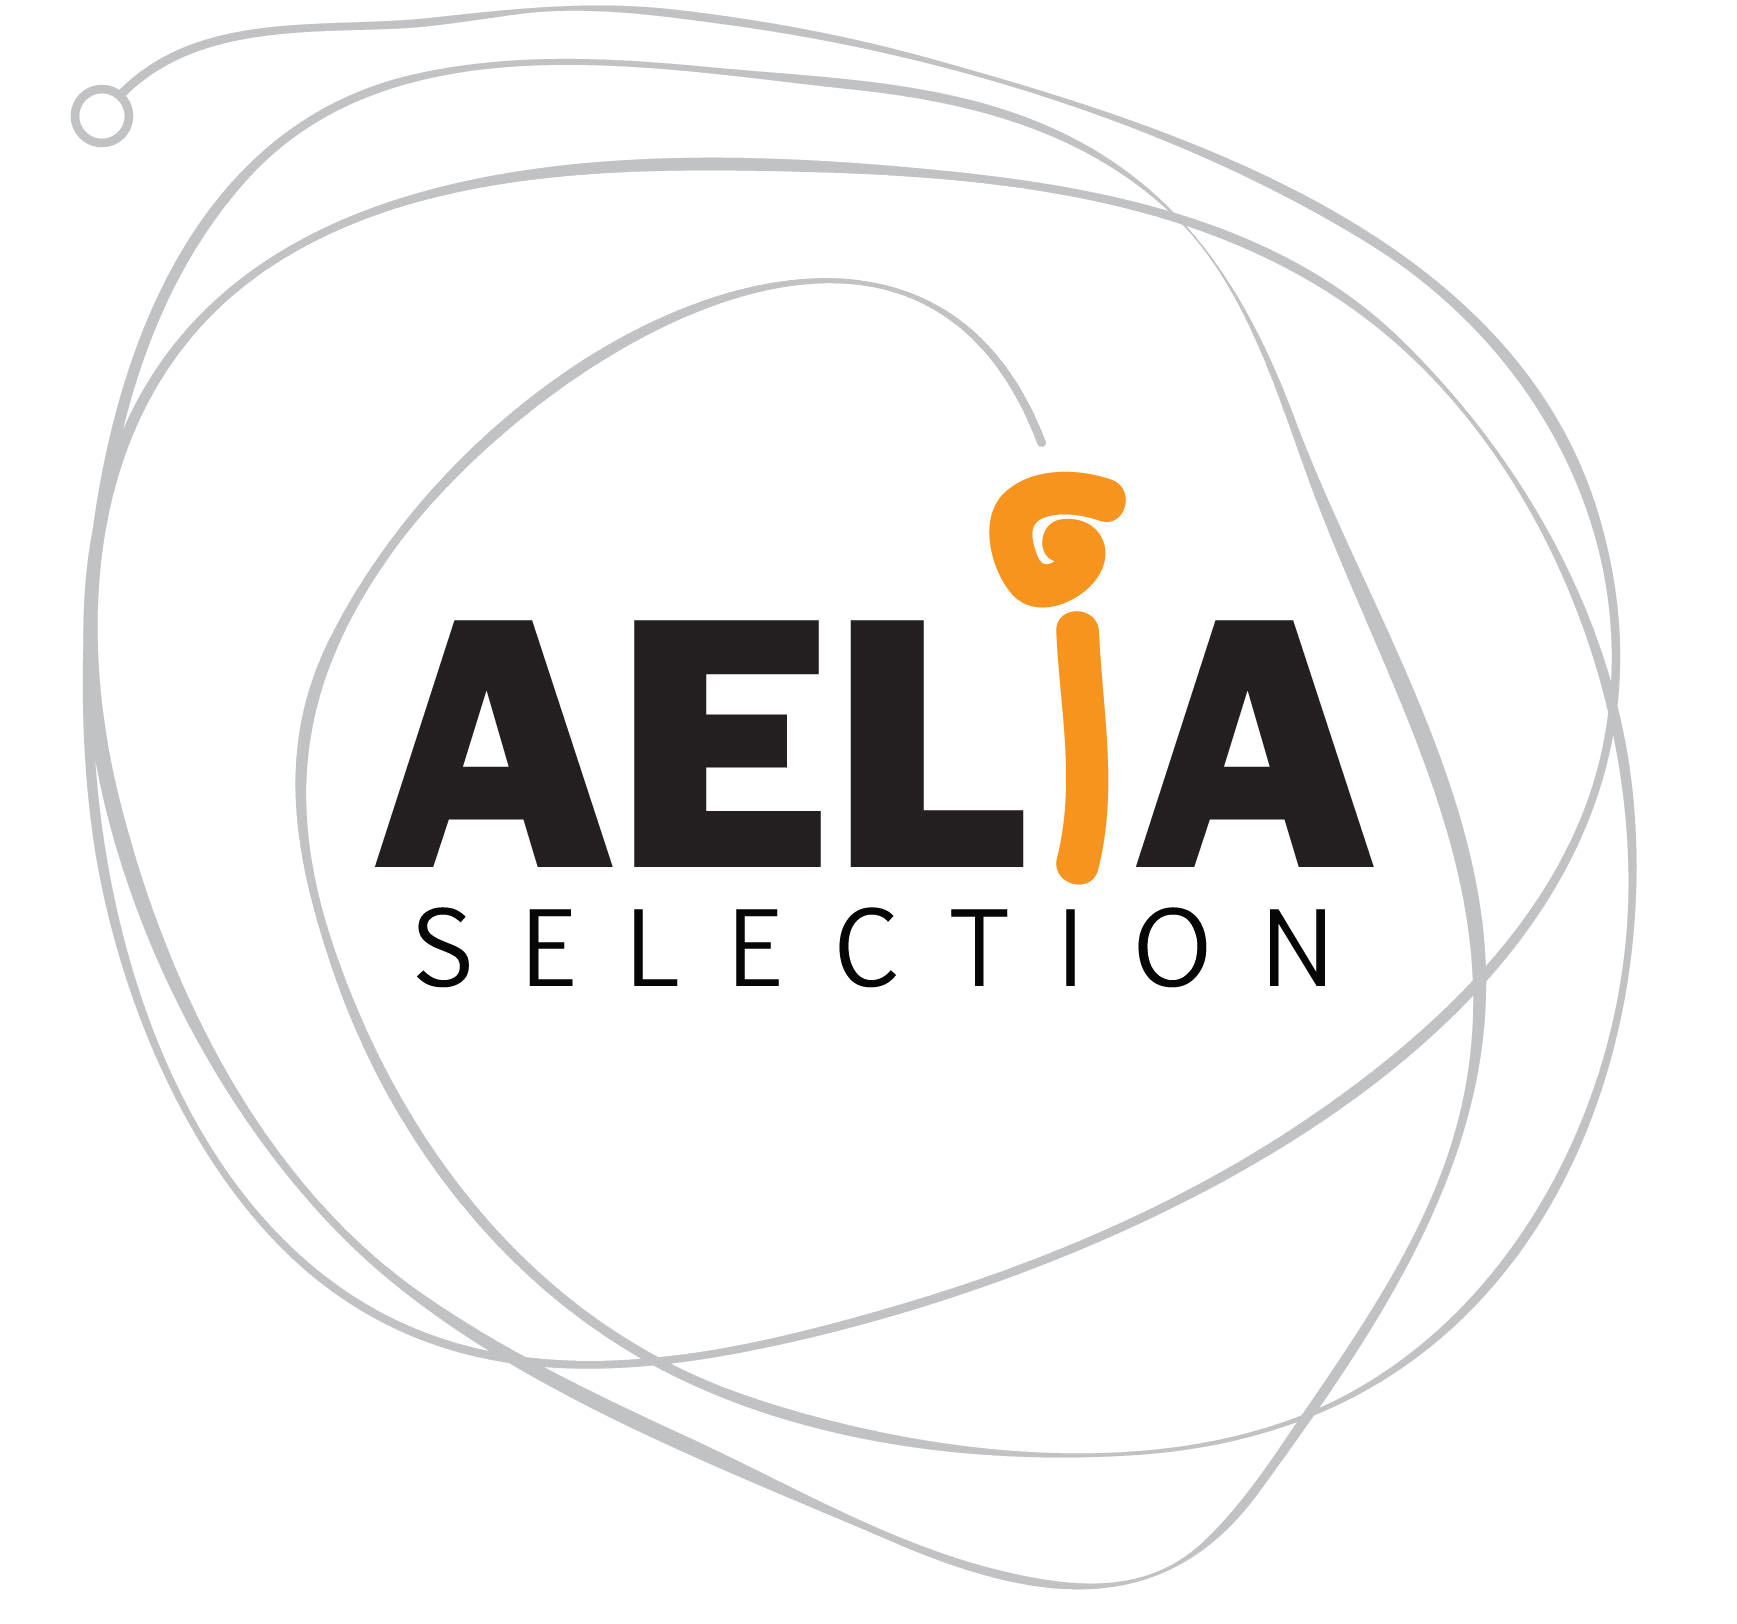 Aelia Selection